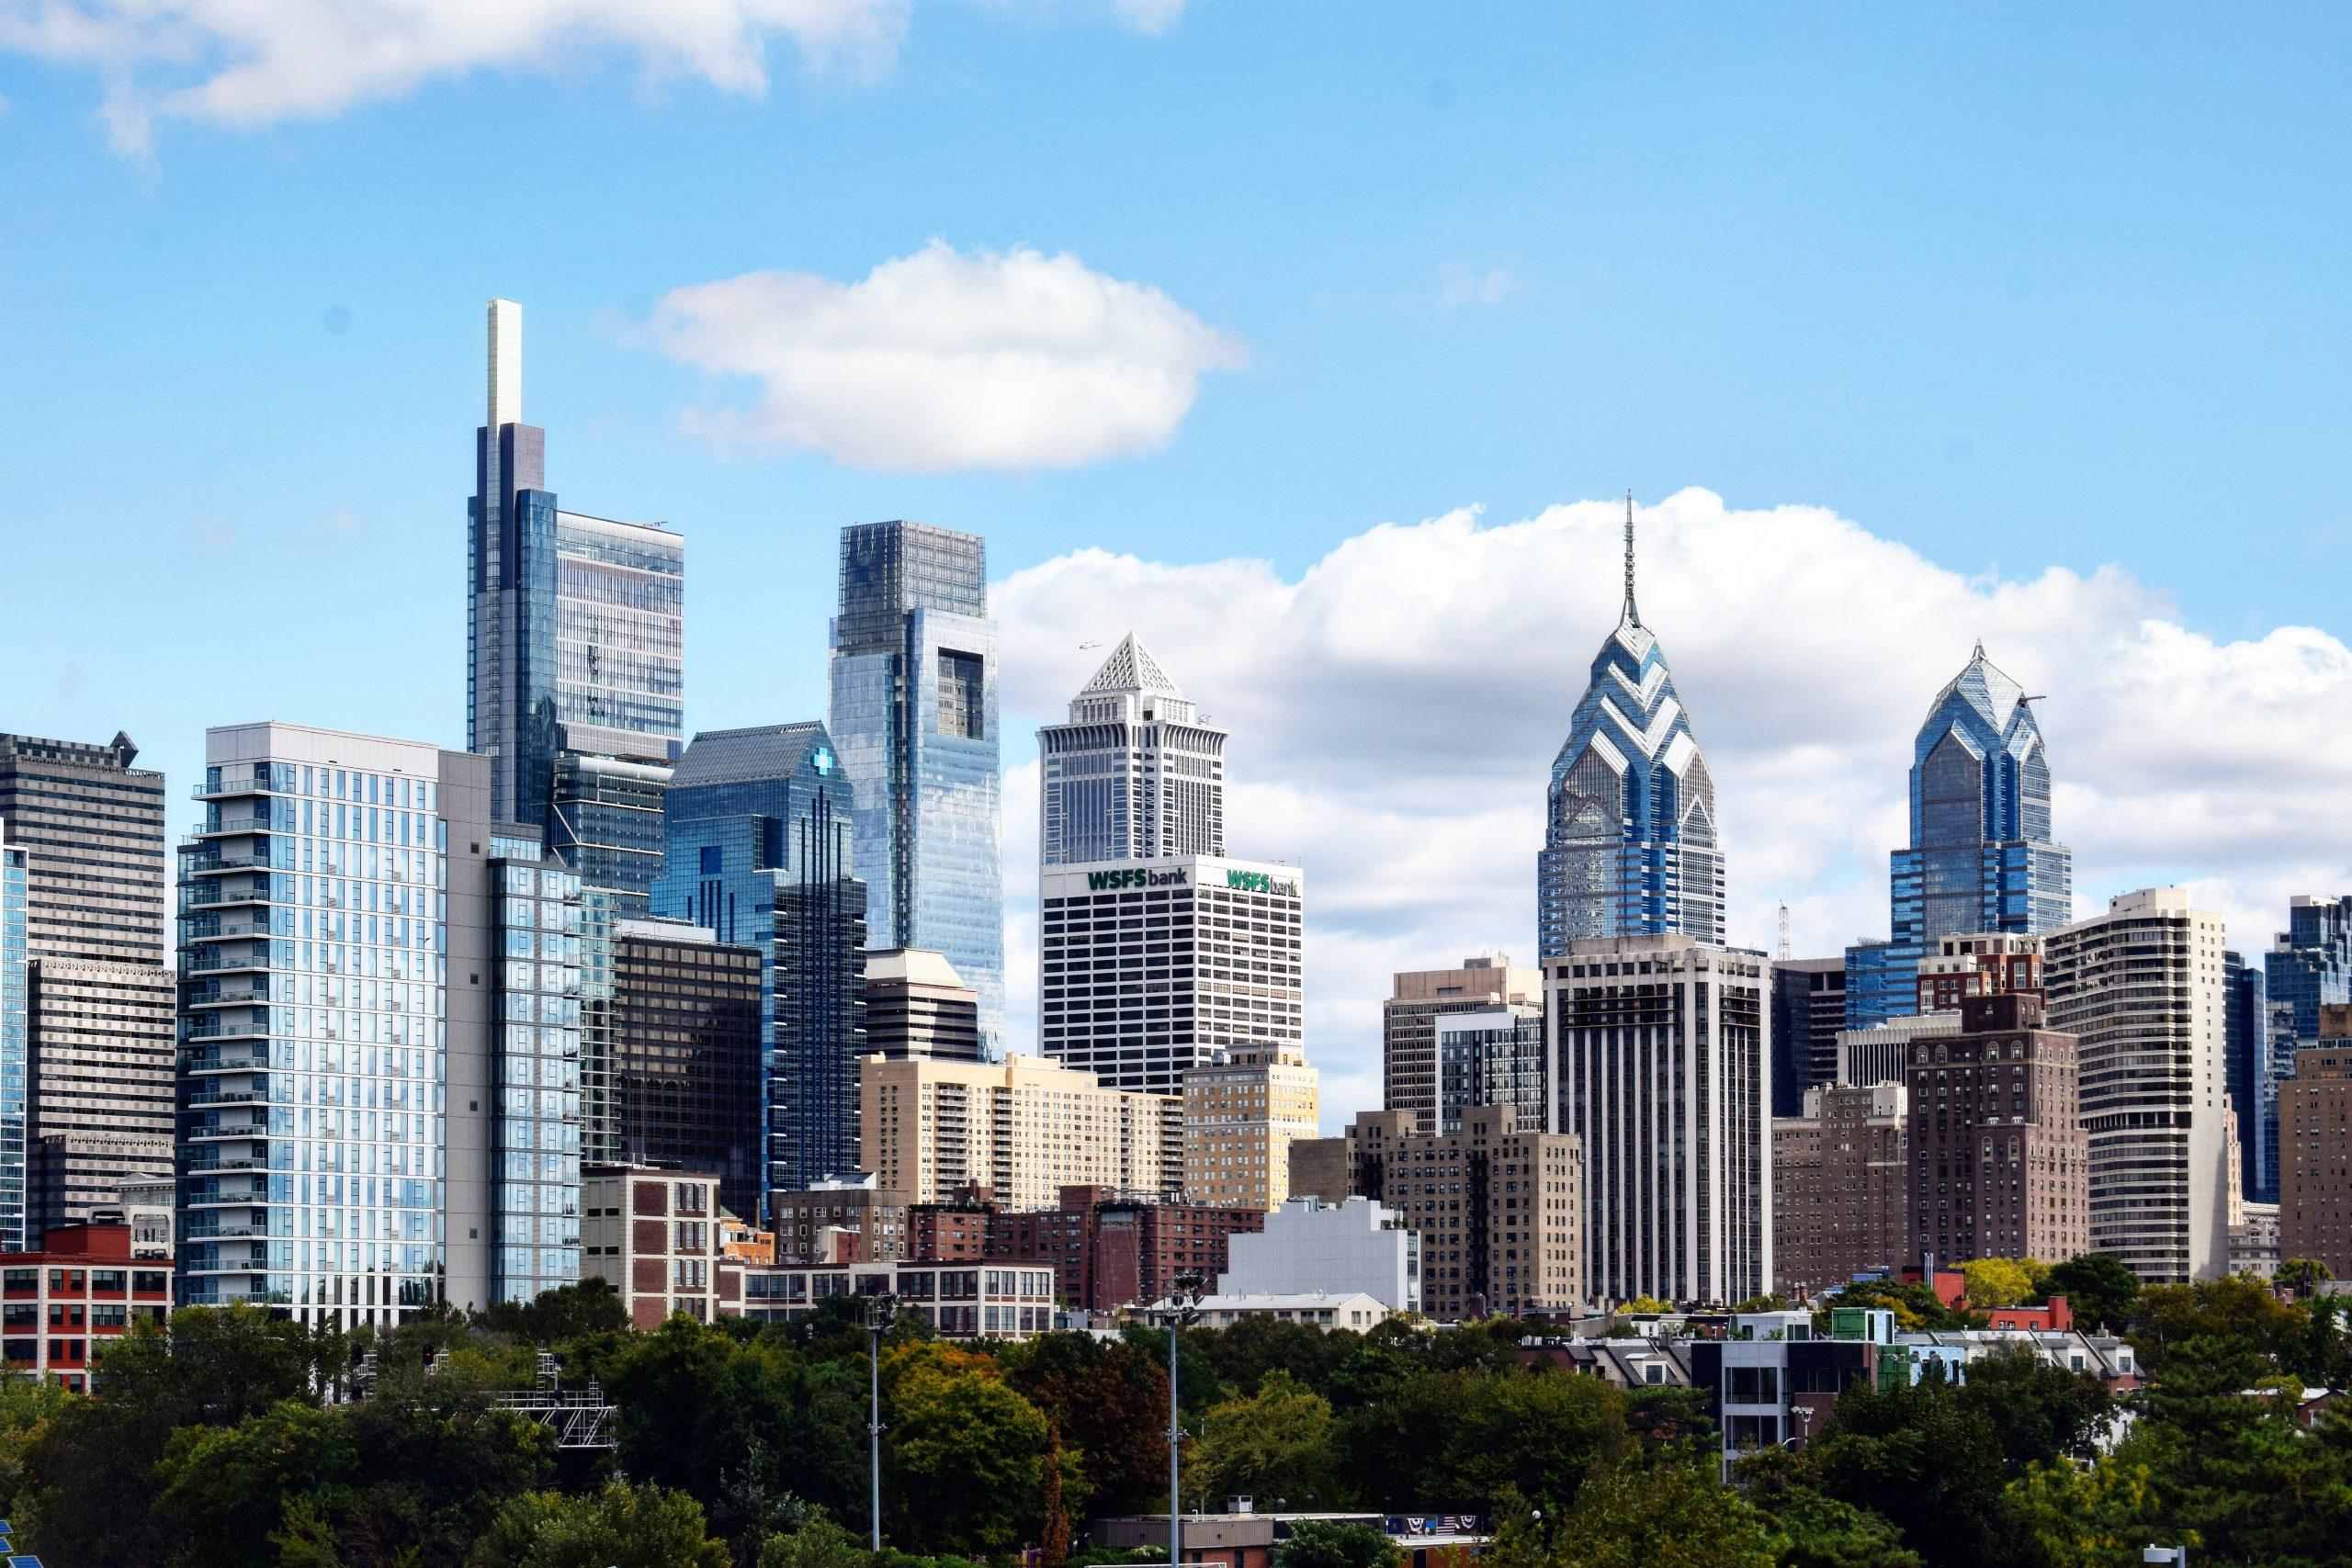 Philadelphia skyline from South Street Bridge. Photo by Thomas Koloski